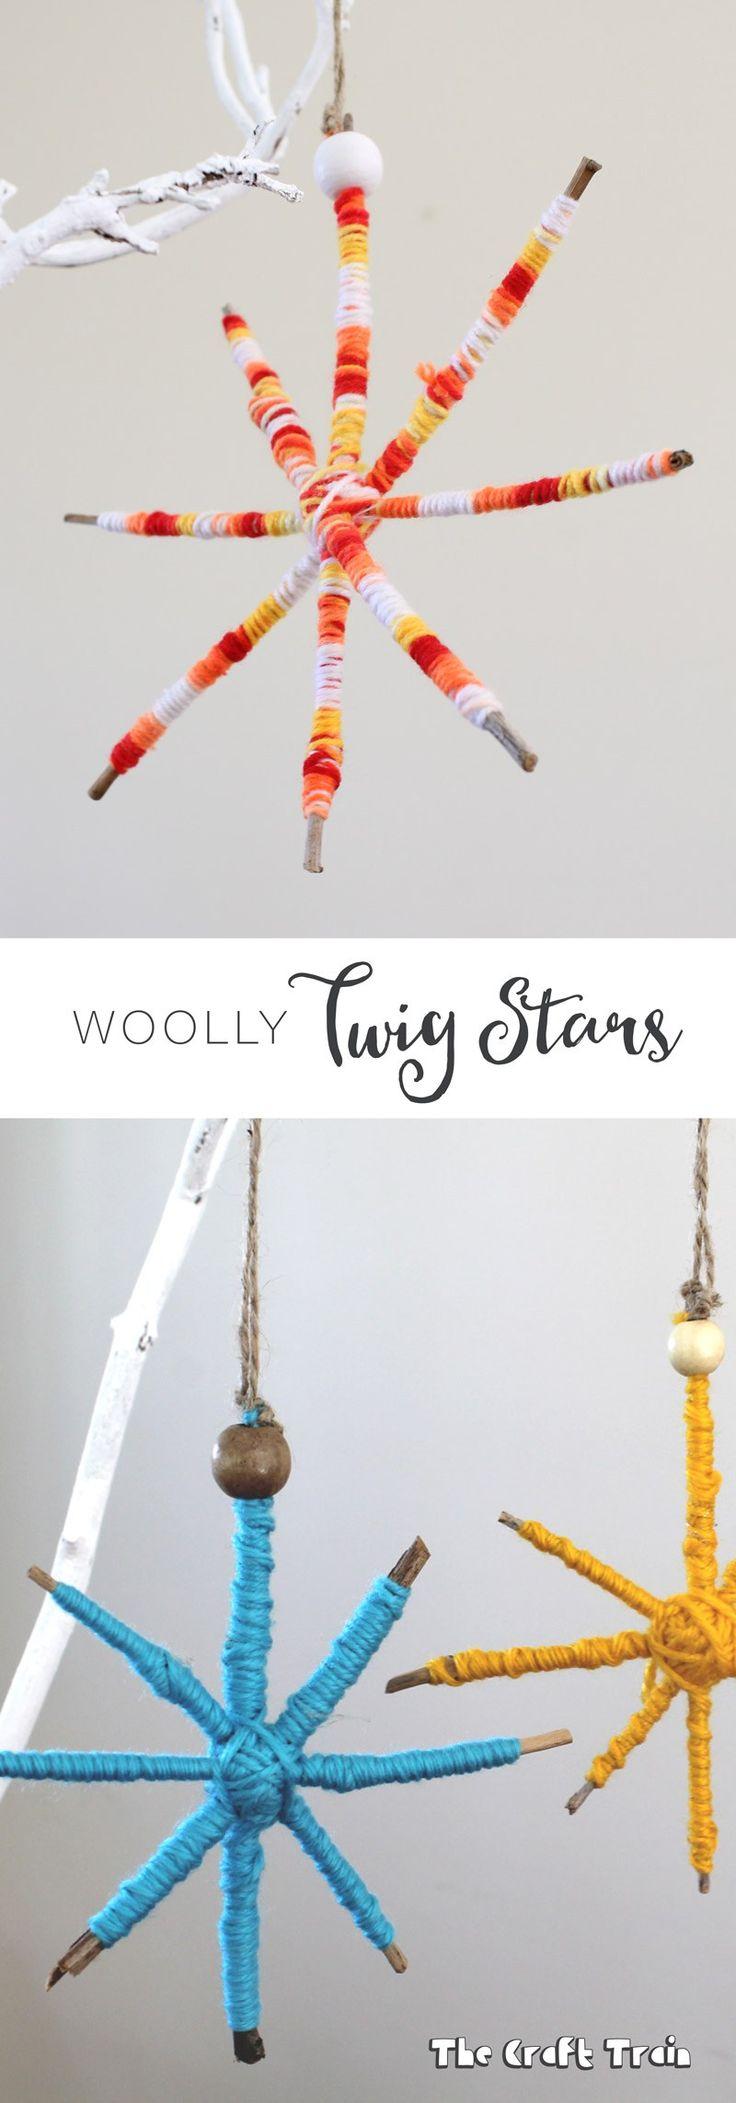 Woolly twig stars